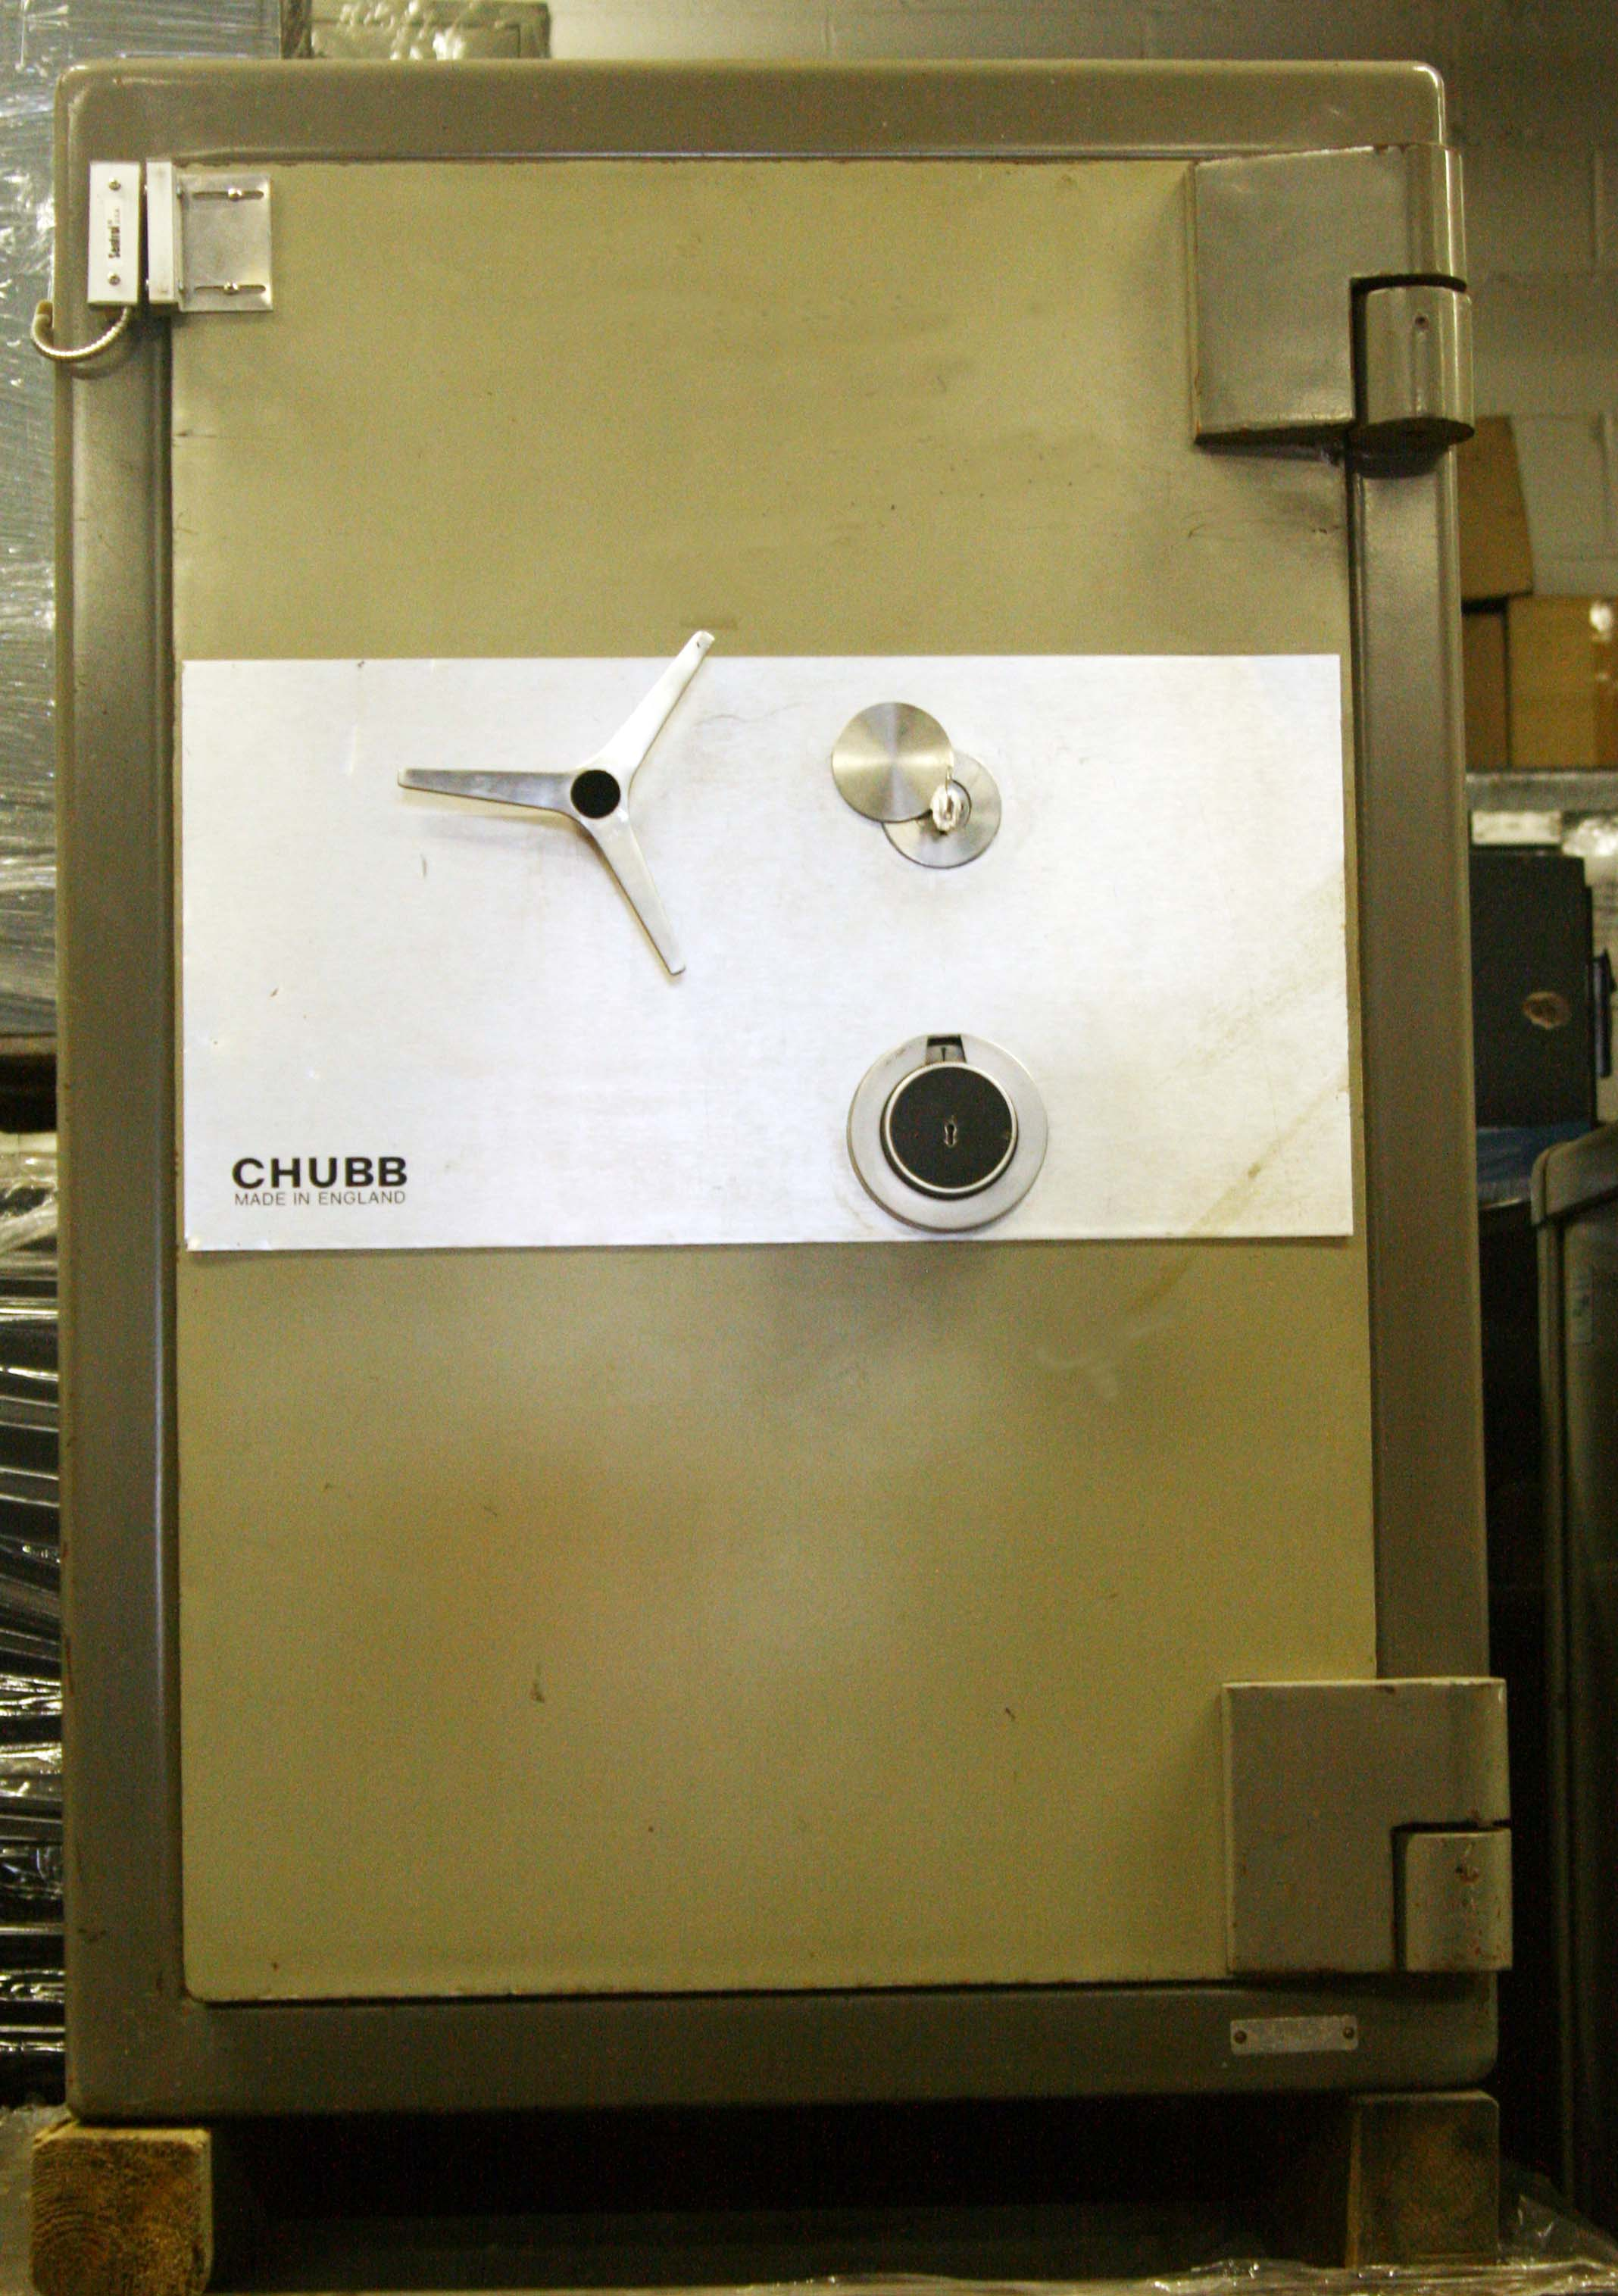 Chatwood-Milner Chubb 3420 TRTL-30x6 Equiv.